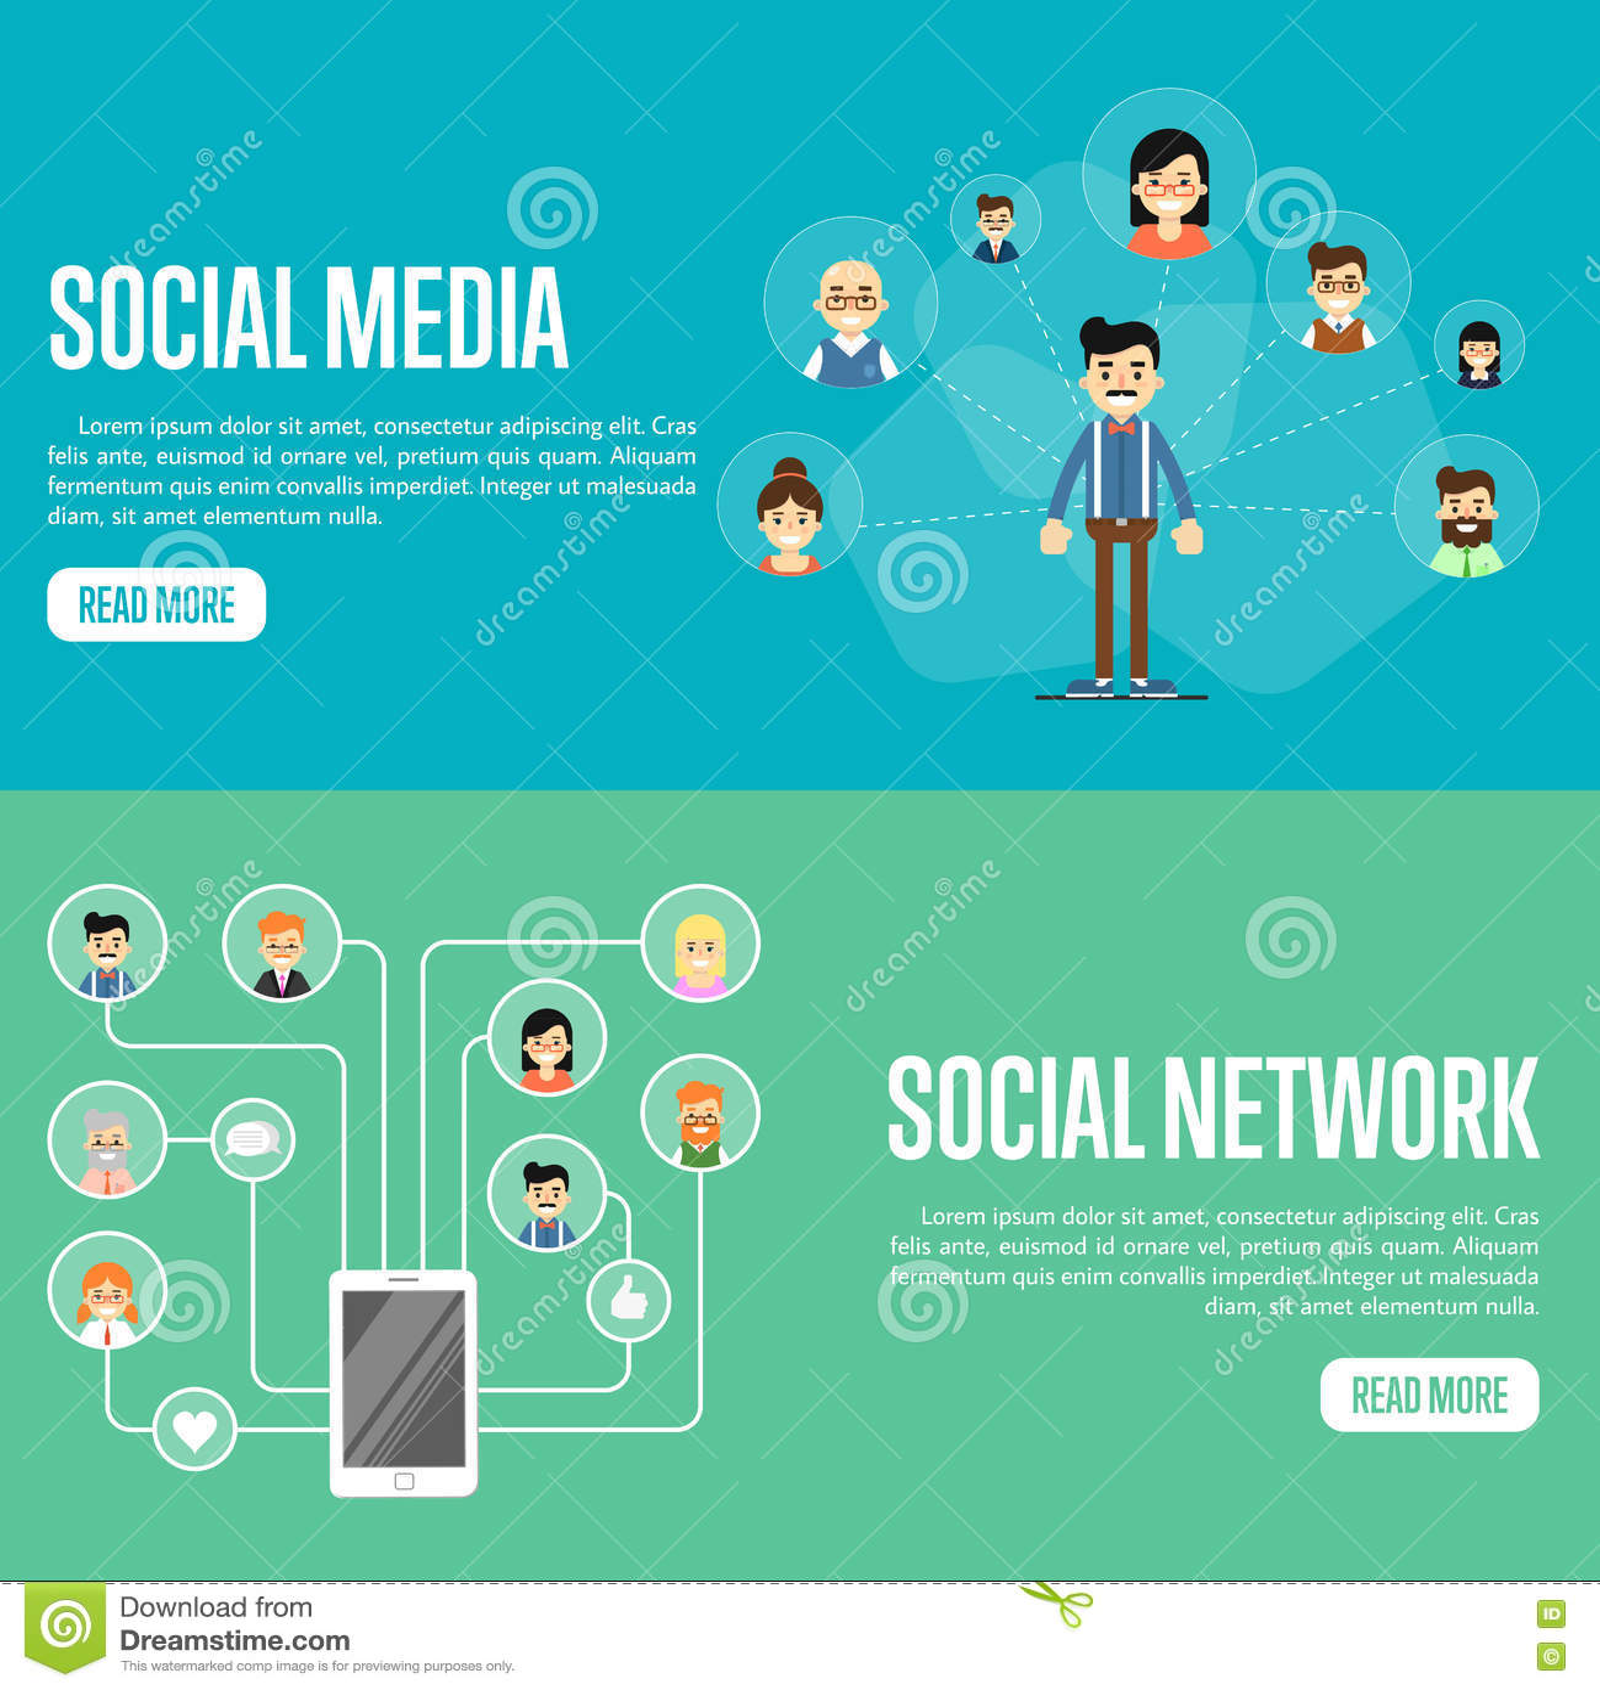 social network site Image/svg+xml image/svg+xml image/svg+xml.